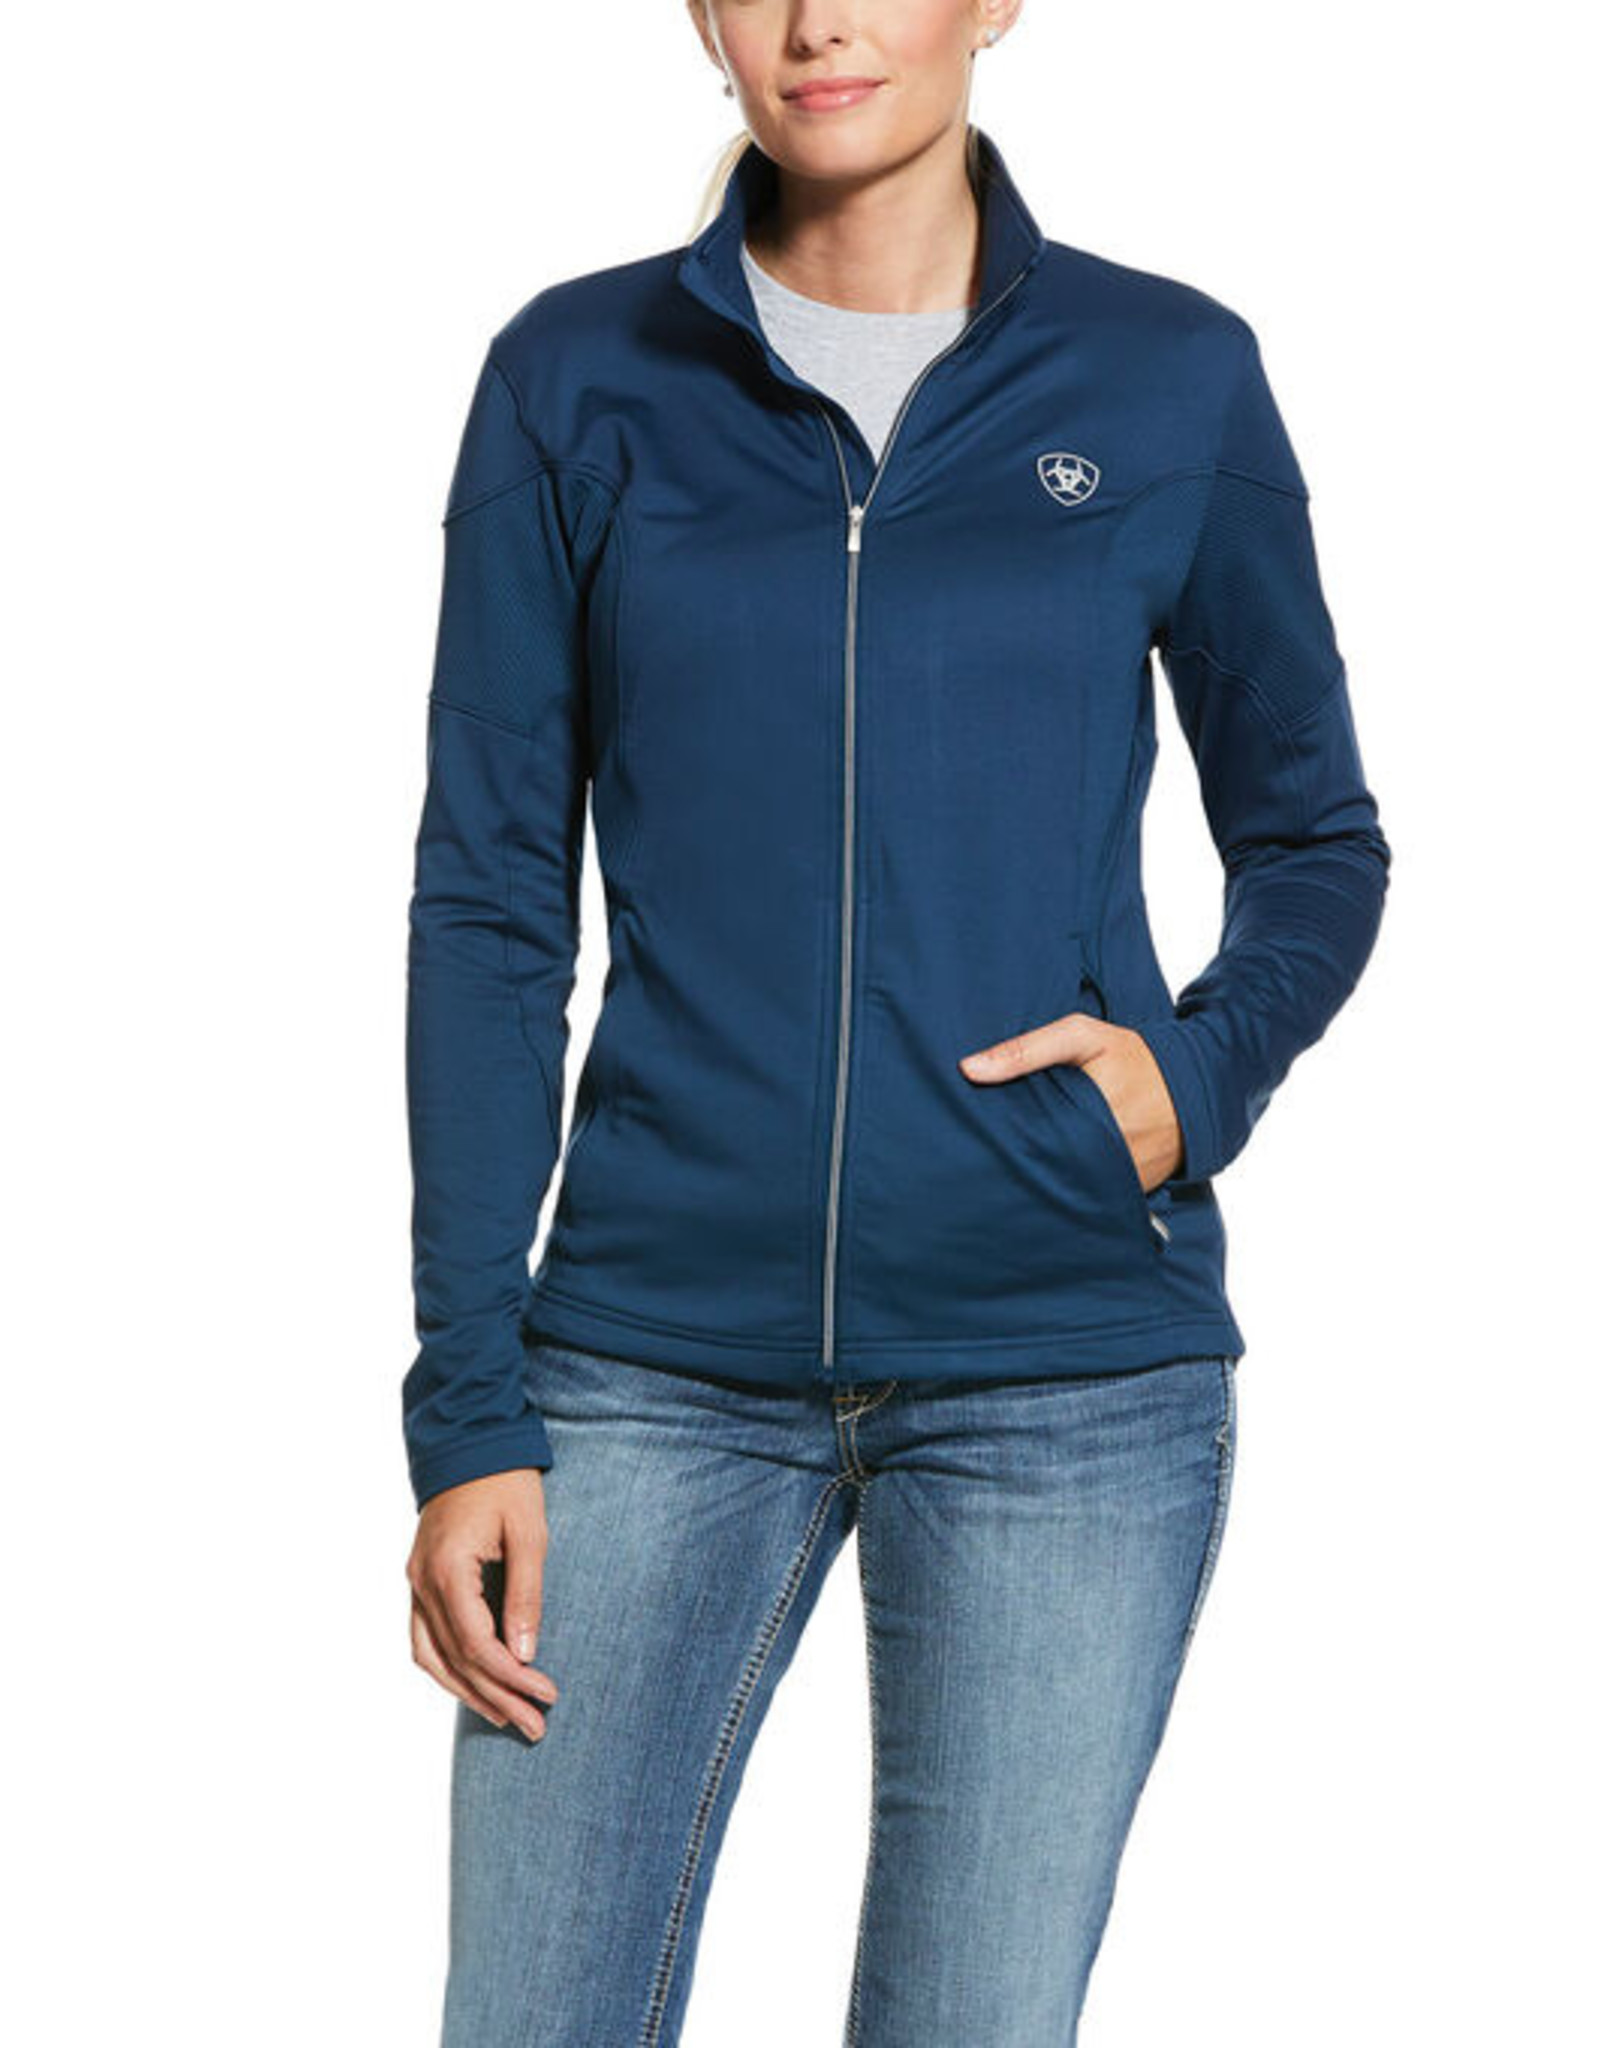 Ariat Ladies' Full Zip Tolt Sweatshirt